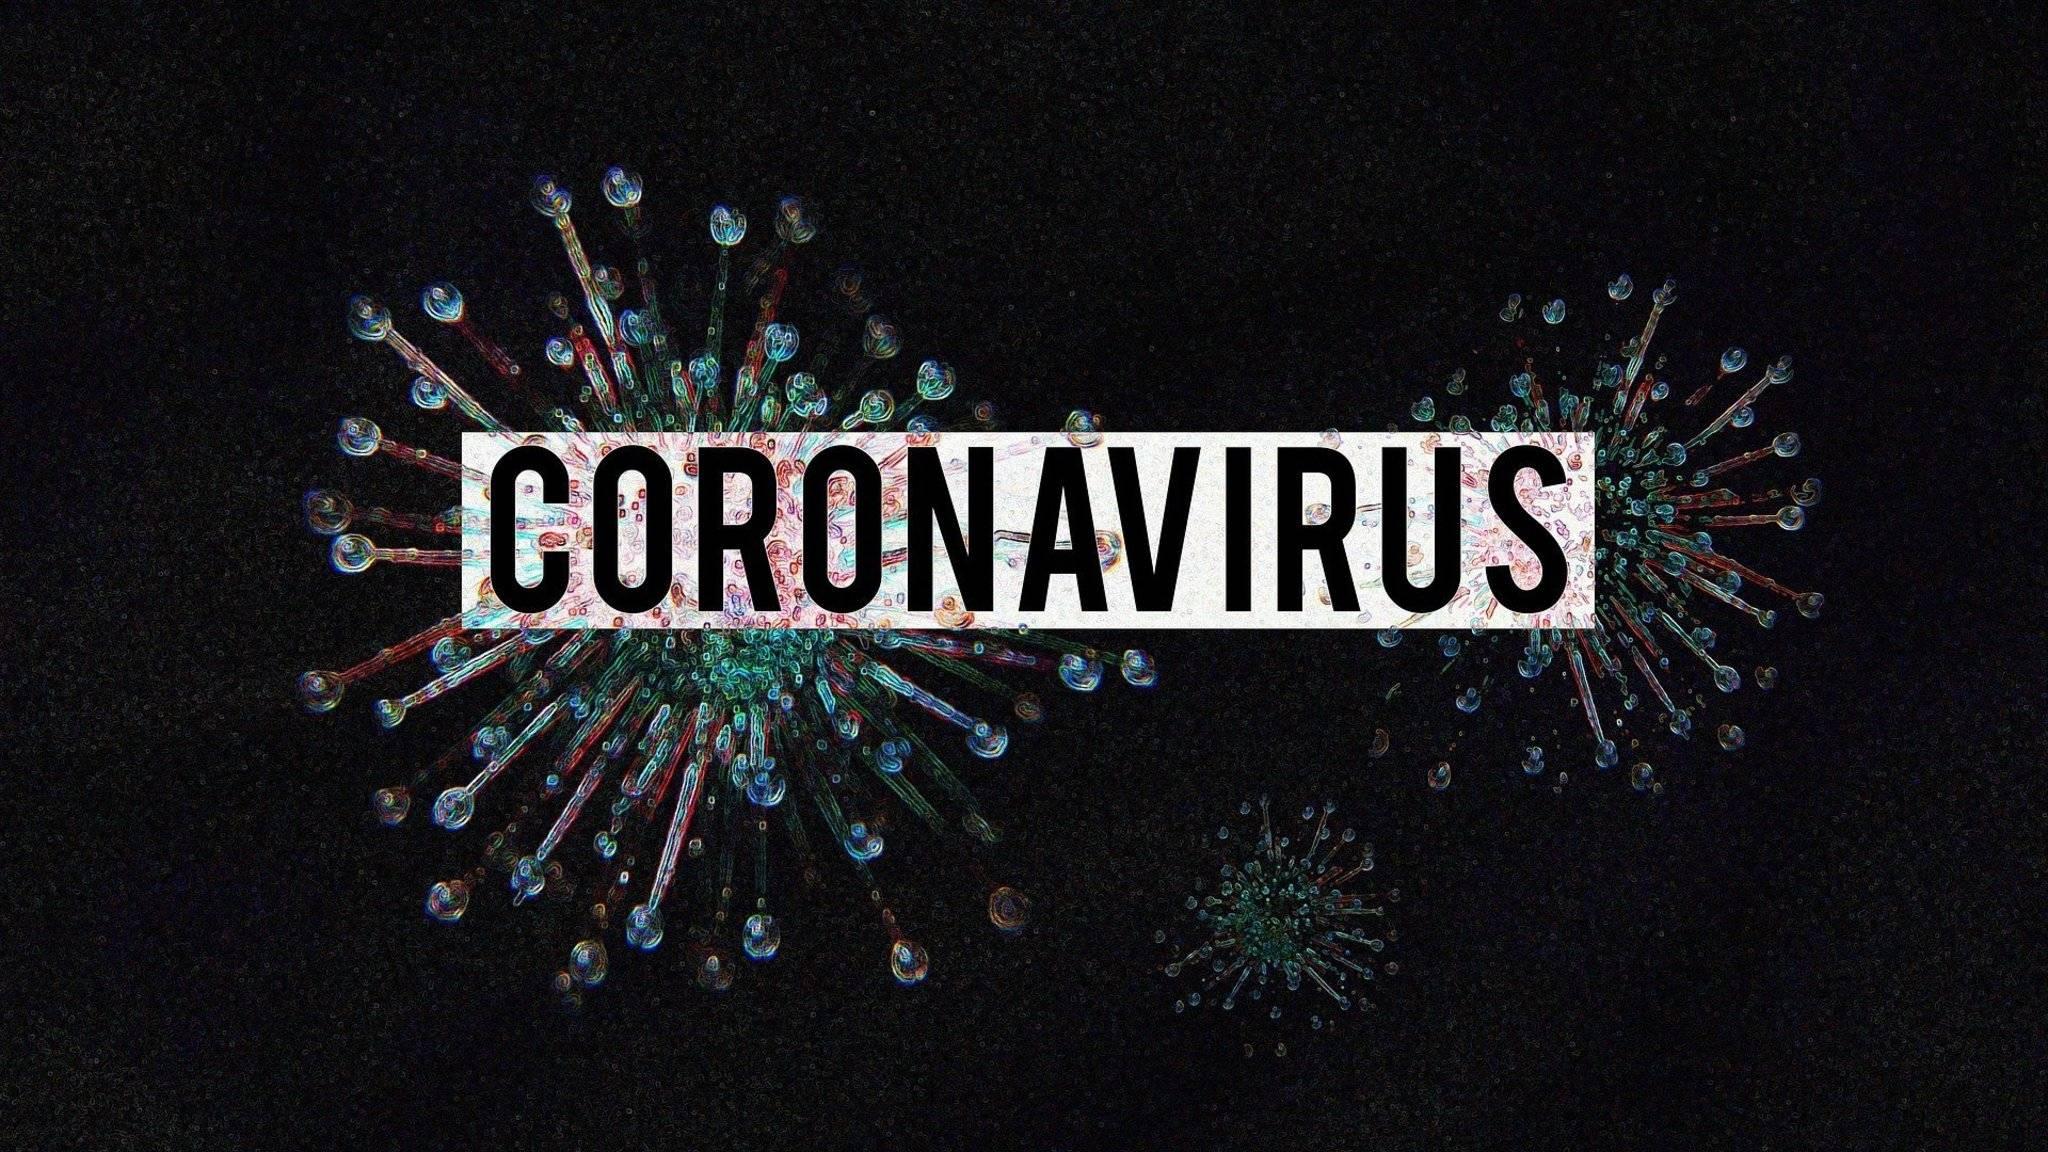 Coronavirus Sars-CoV-2